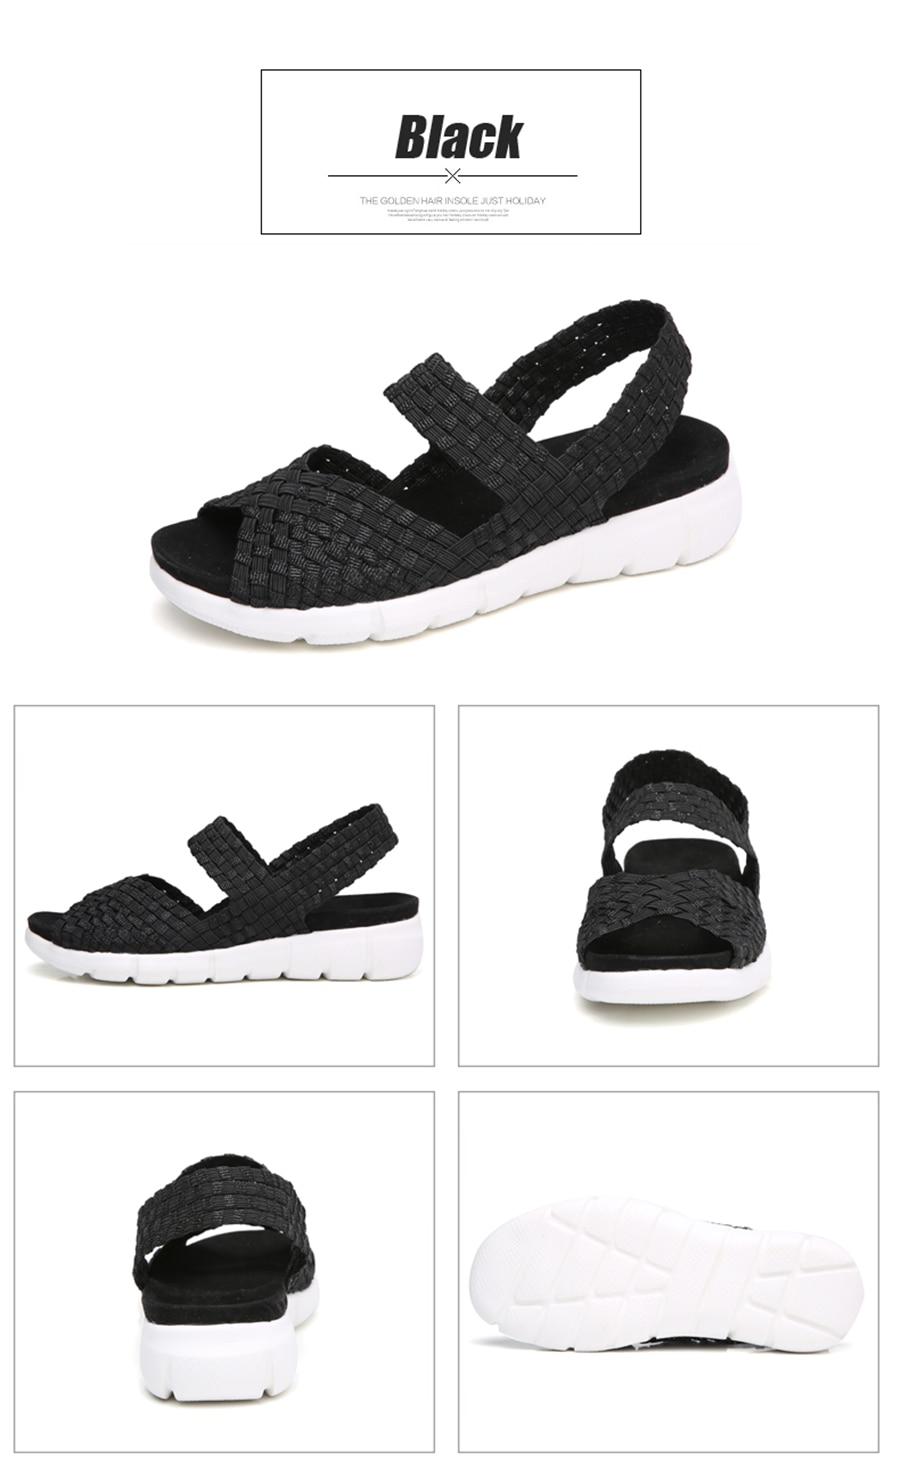 HTB16Q1wDkyWBuNjy0Fpq6yssXXas STQ 2019 women flat sandals shoes women woven wedge sandals ladies beach summer slingback sandals flipflops jelly shoes 803